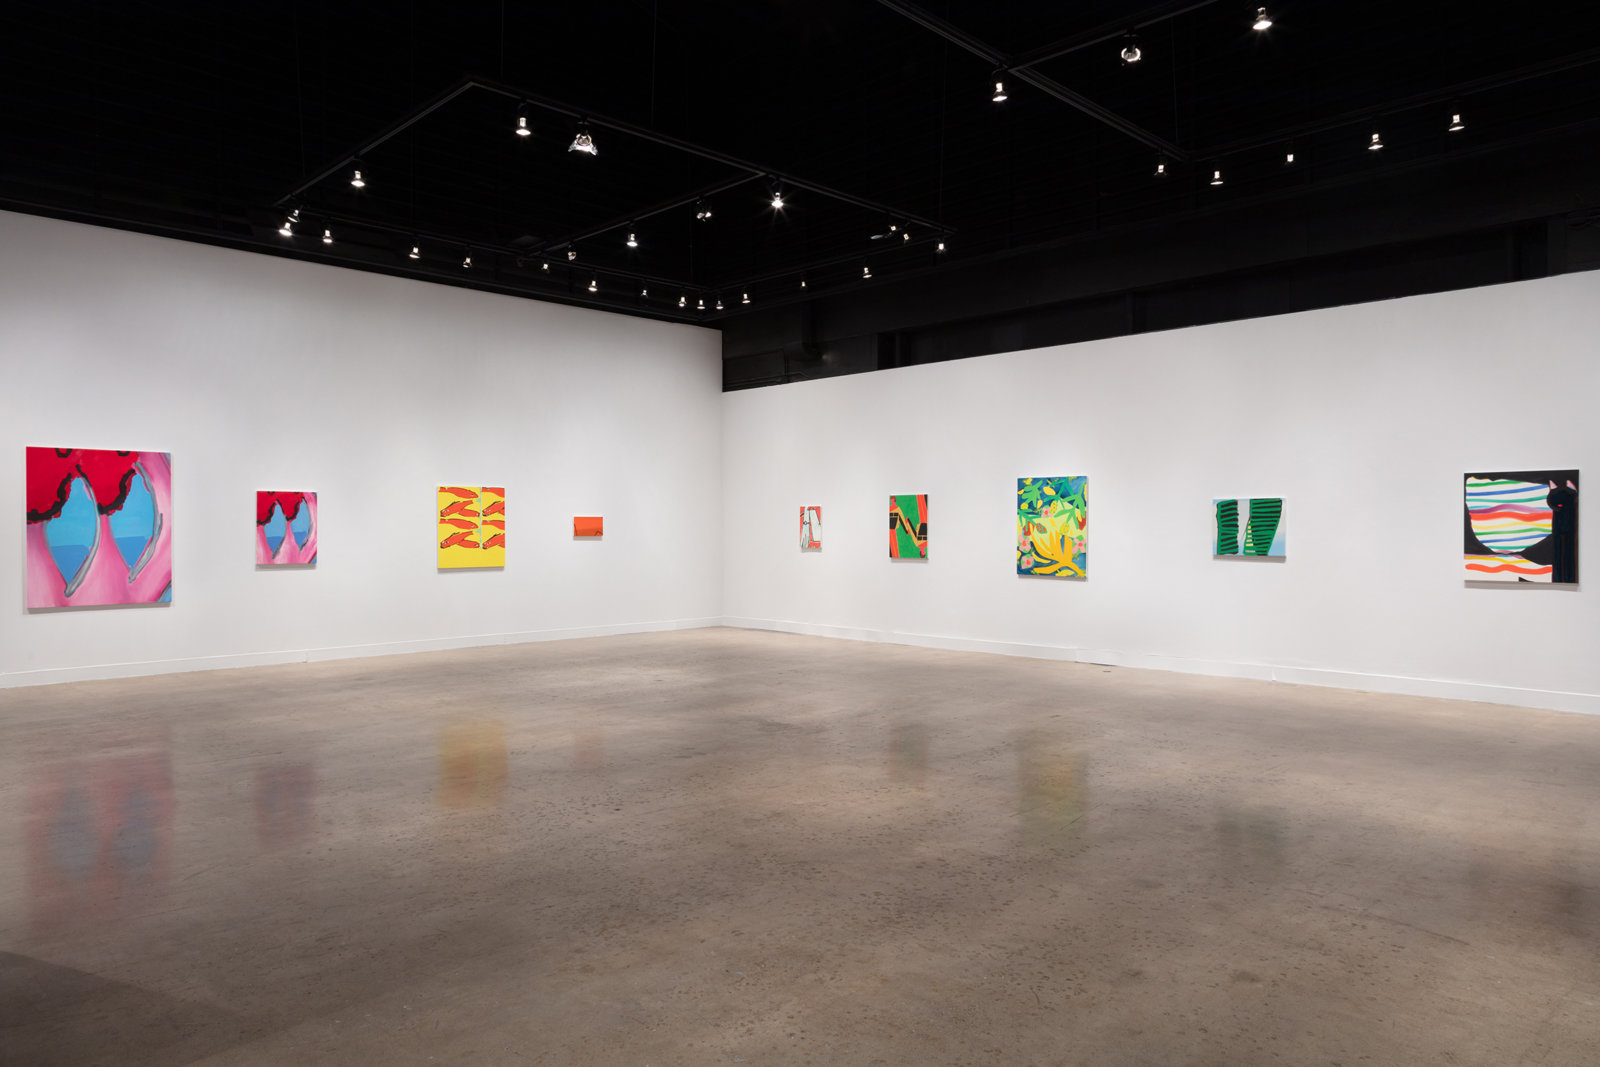 Elizabeth McIntosh, installation view, Show Up, Oakville Galleries, Centennial Square, Oakville, Canada, 2020 by Elizabeth McIntosh